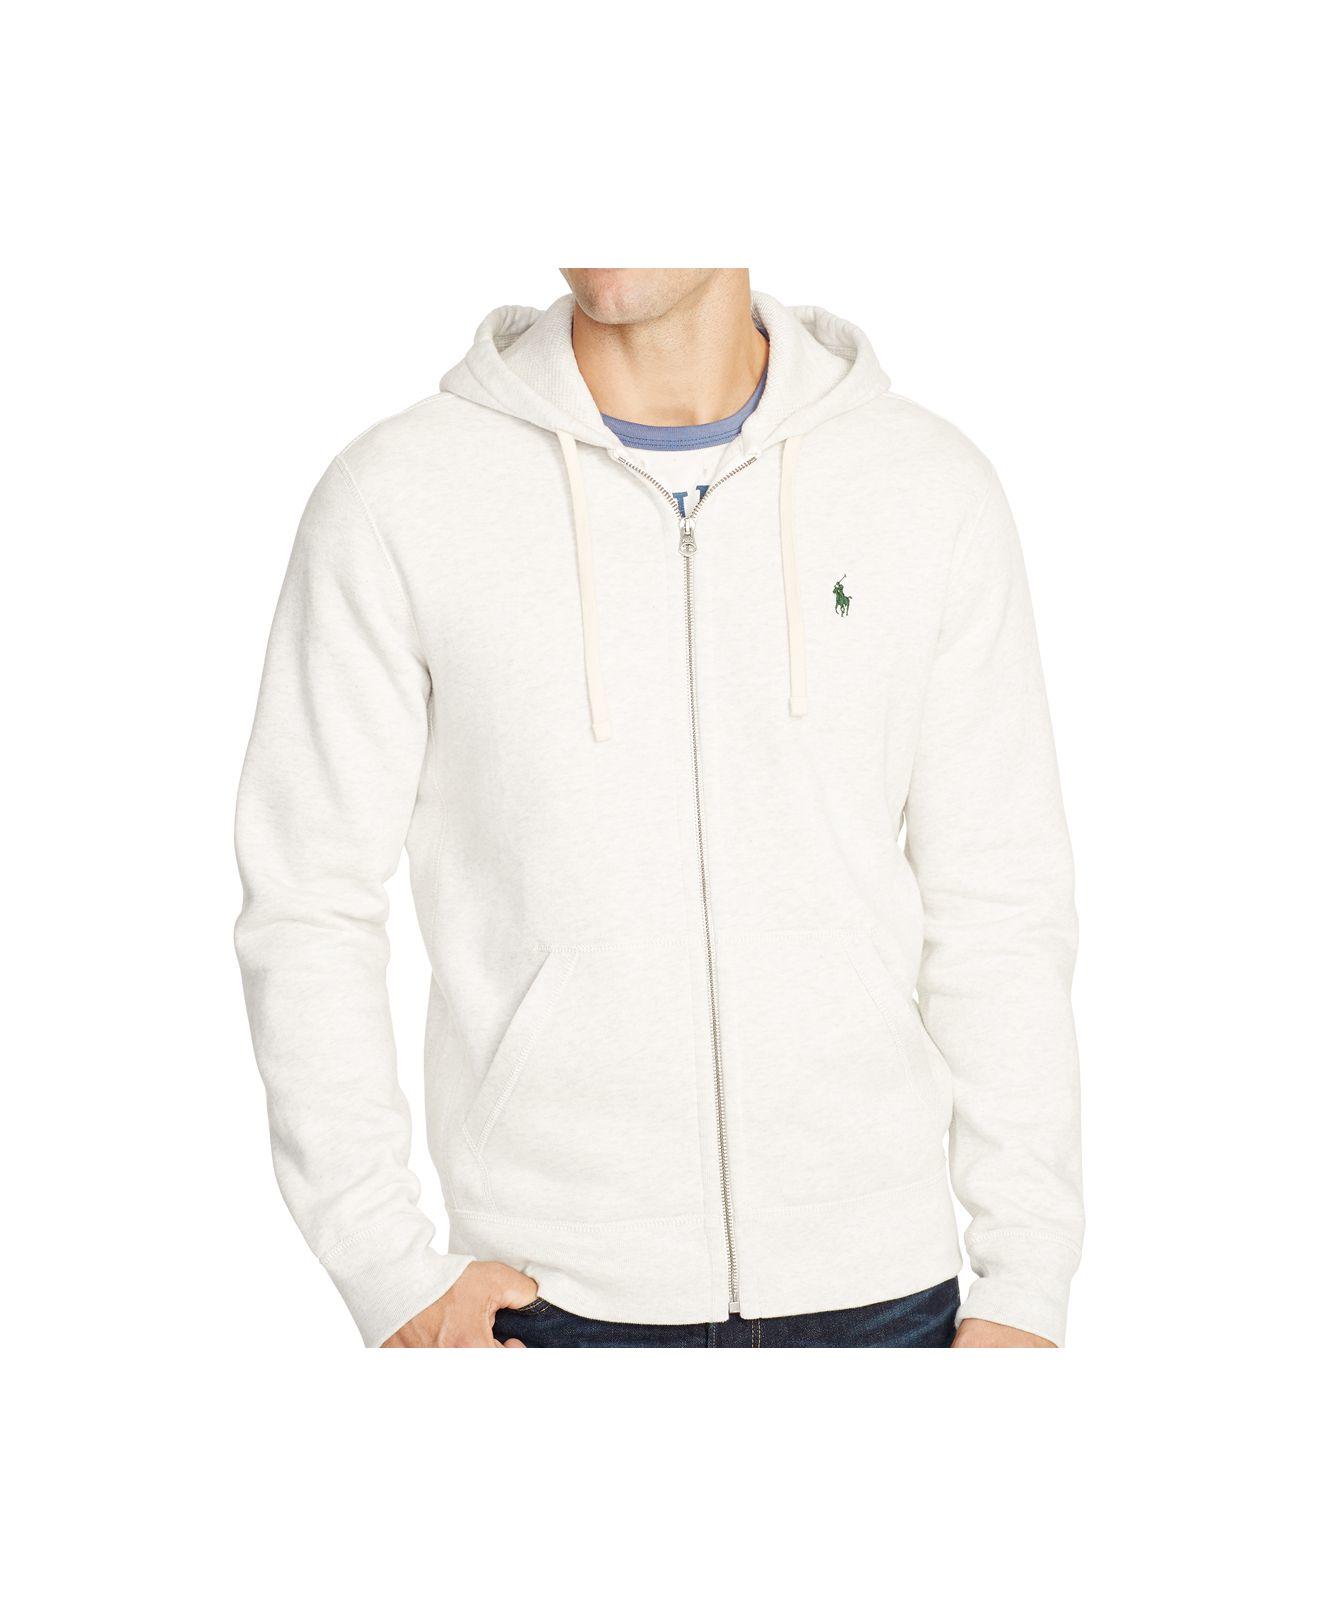 Lyst Polo Ralph Lauren Full Zip Hoodie In White For Men